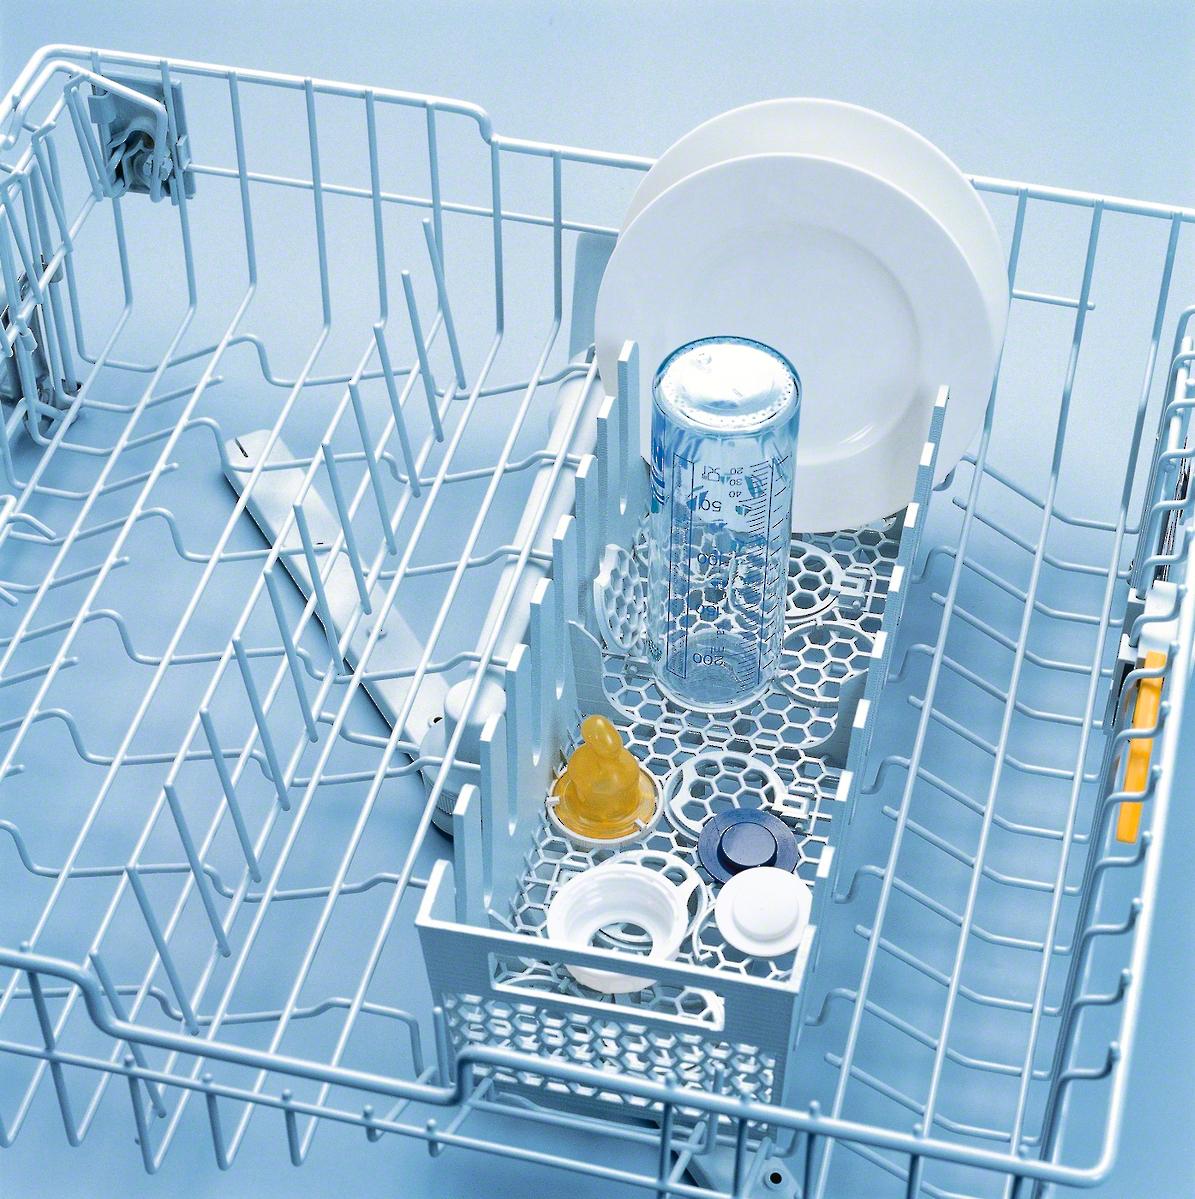 Miele GMFO Multi-purpose dishwasher basket